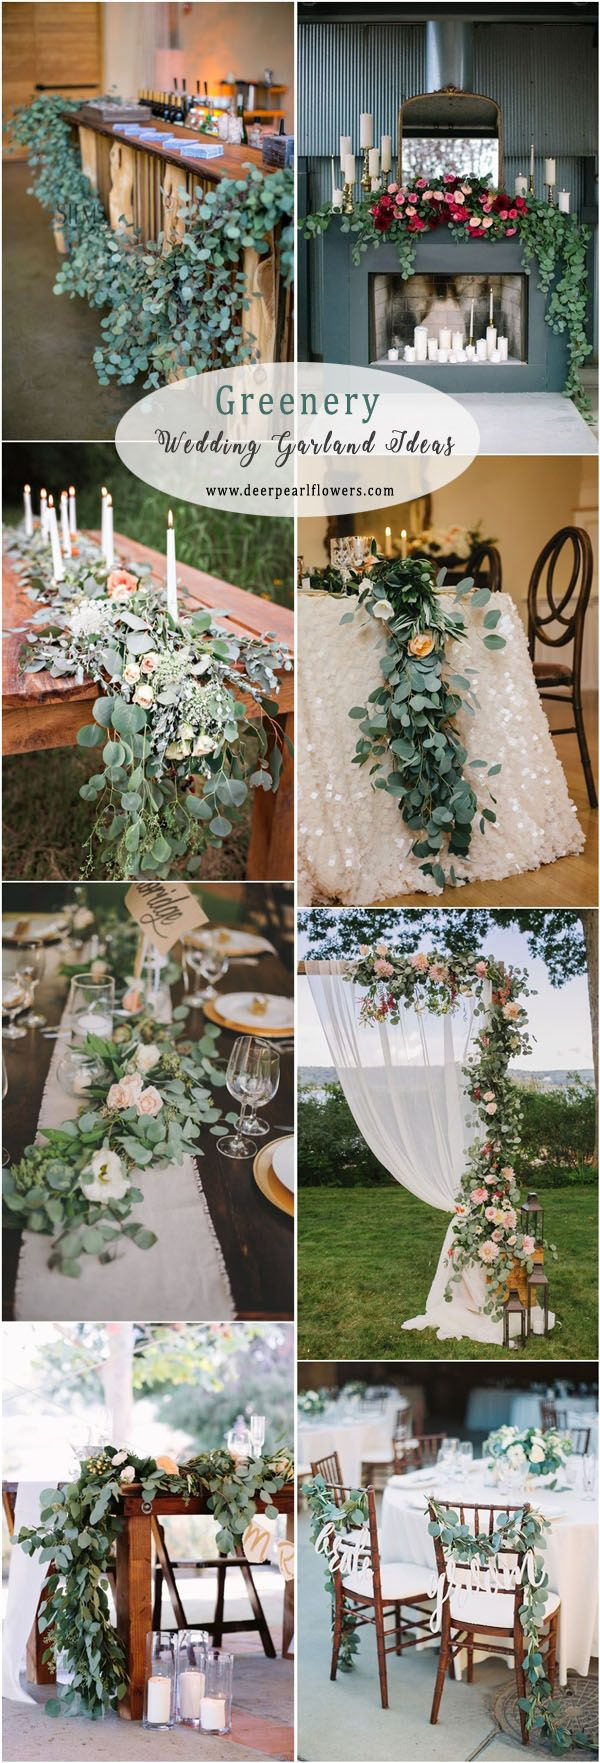 Viking wedding decorations october 2018  best Weddings images on Pinterest  Wedding ideas Wedding